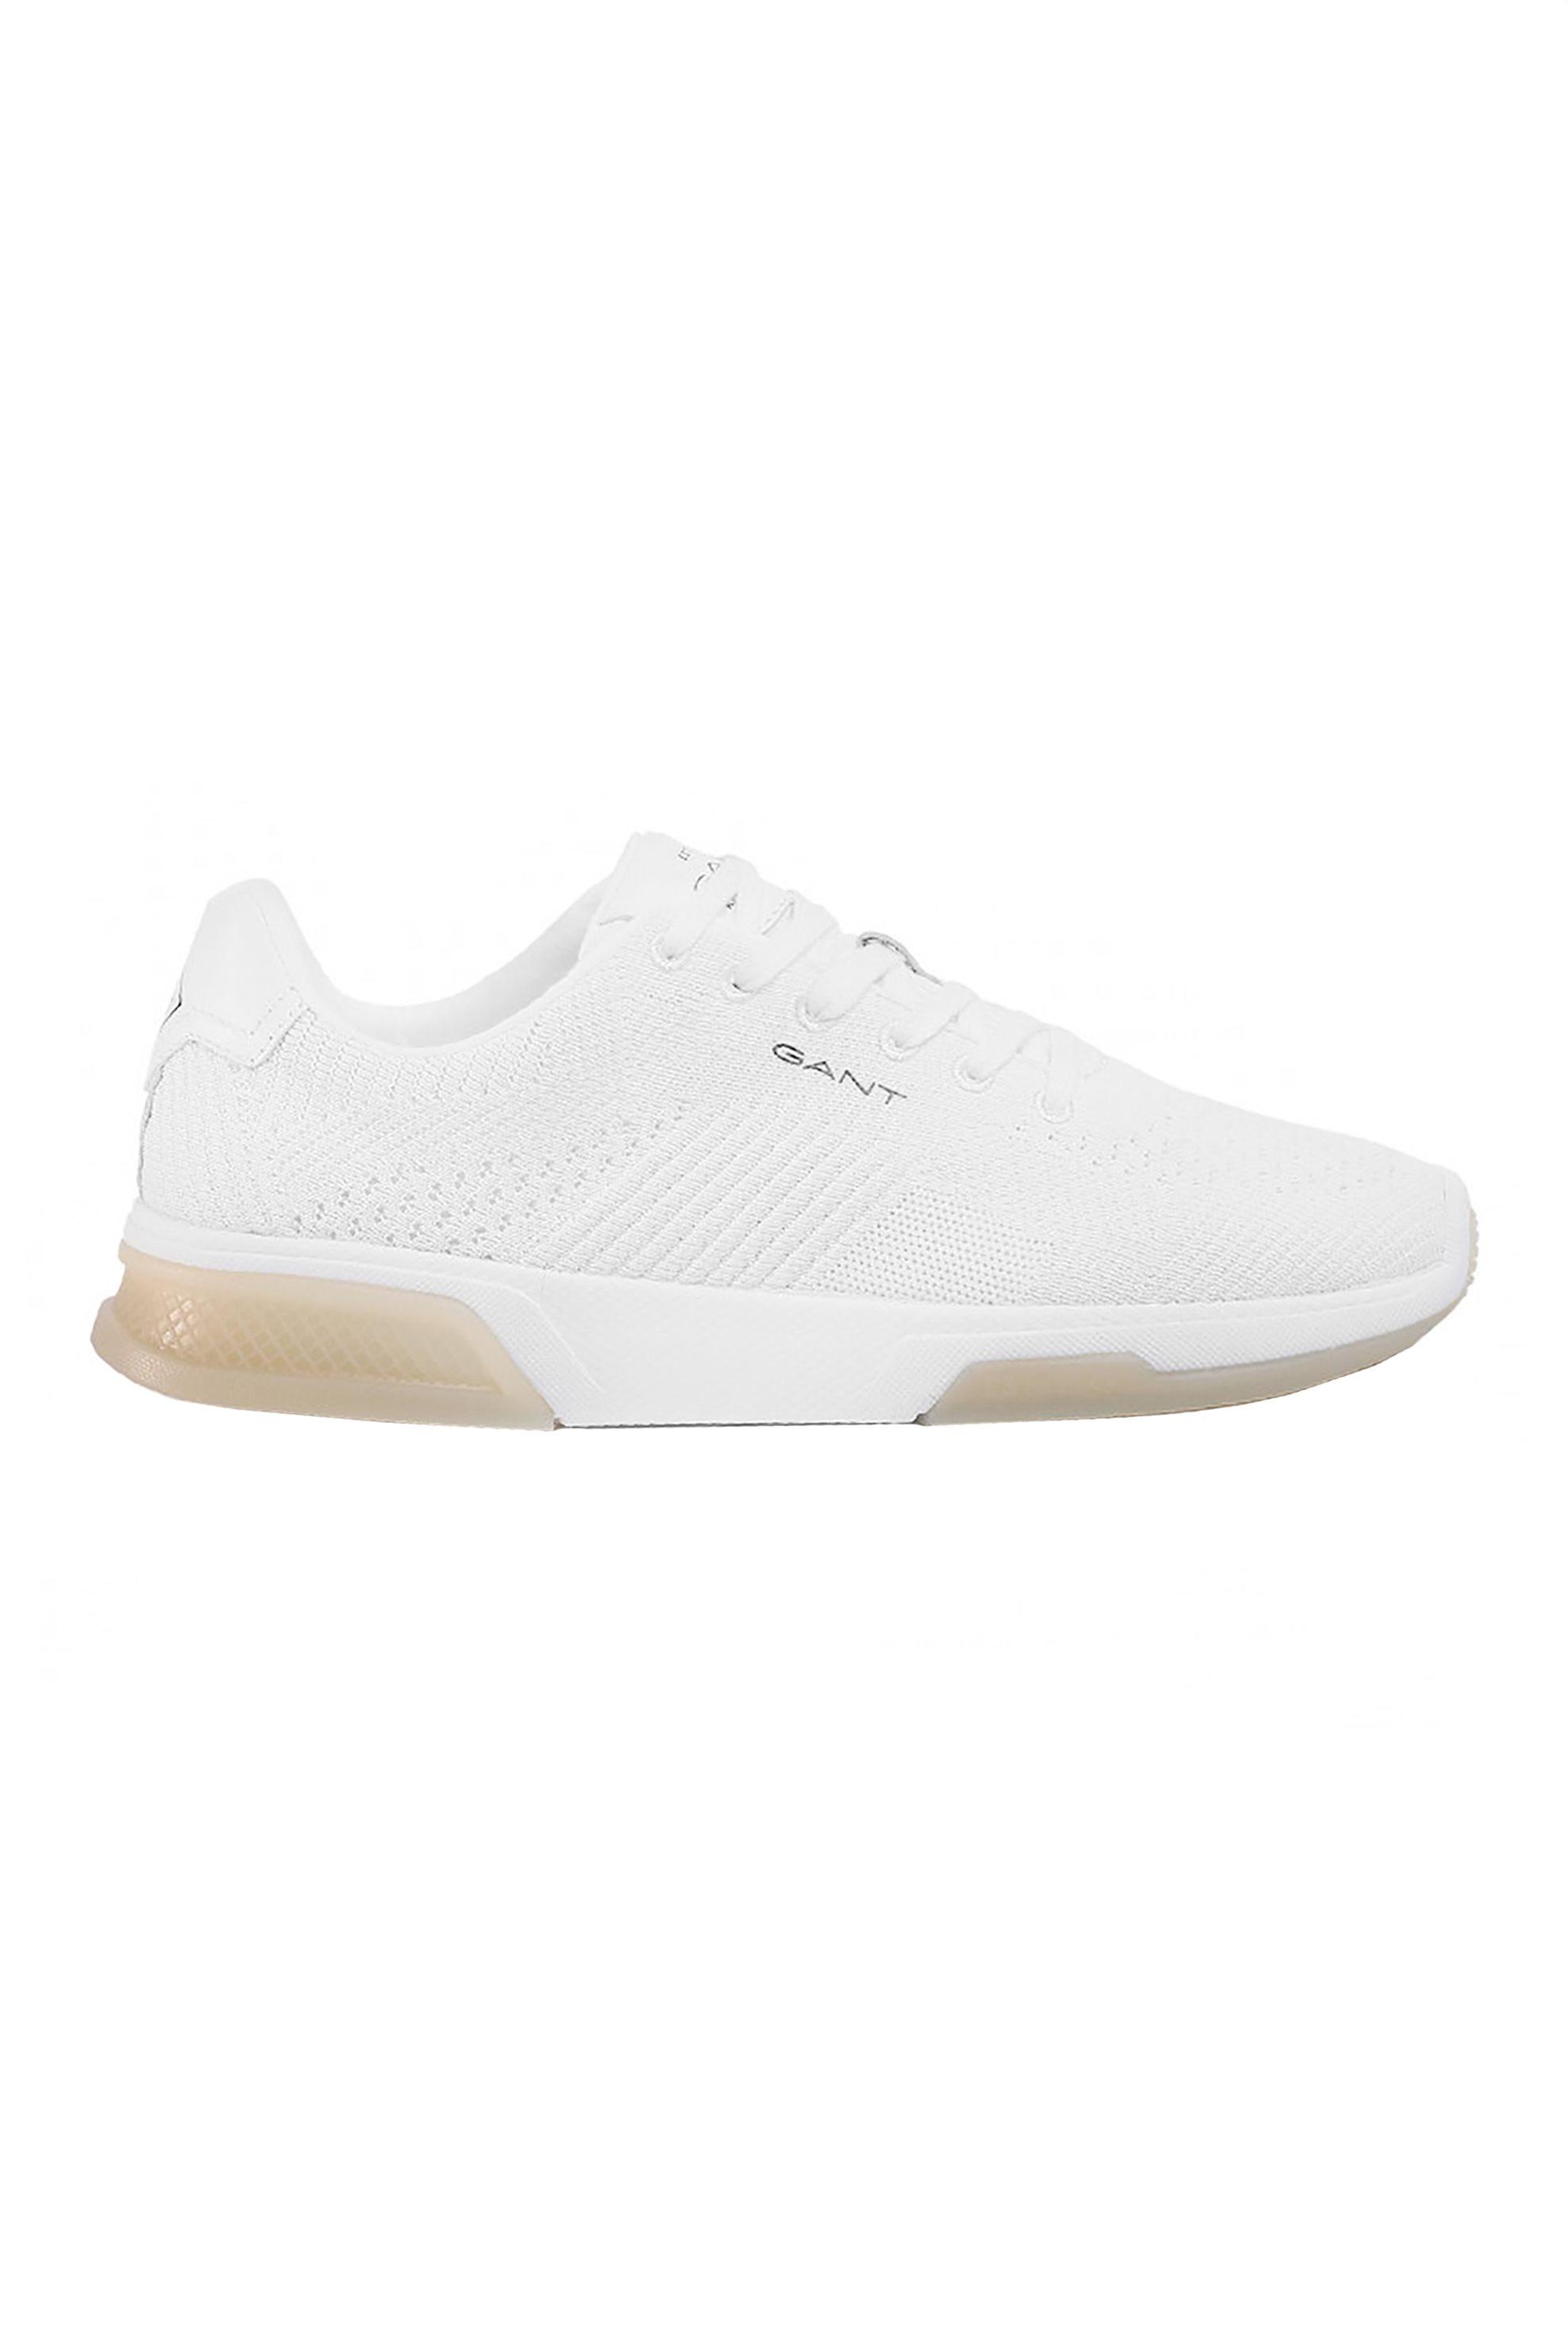 "Gant ανδρικά sneakers με κορδόνια ""Hightown"" – 20639528 – Λευκό"